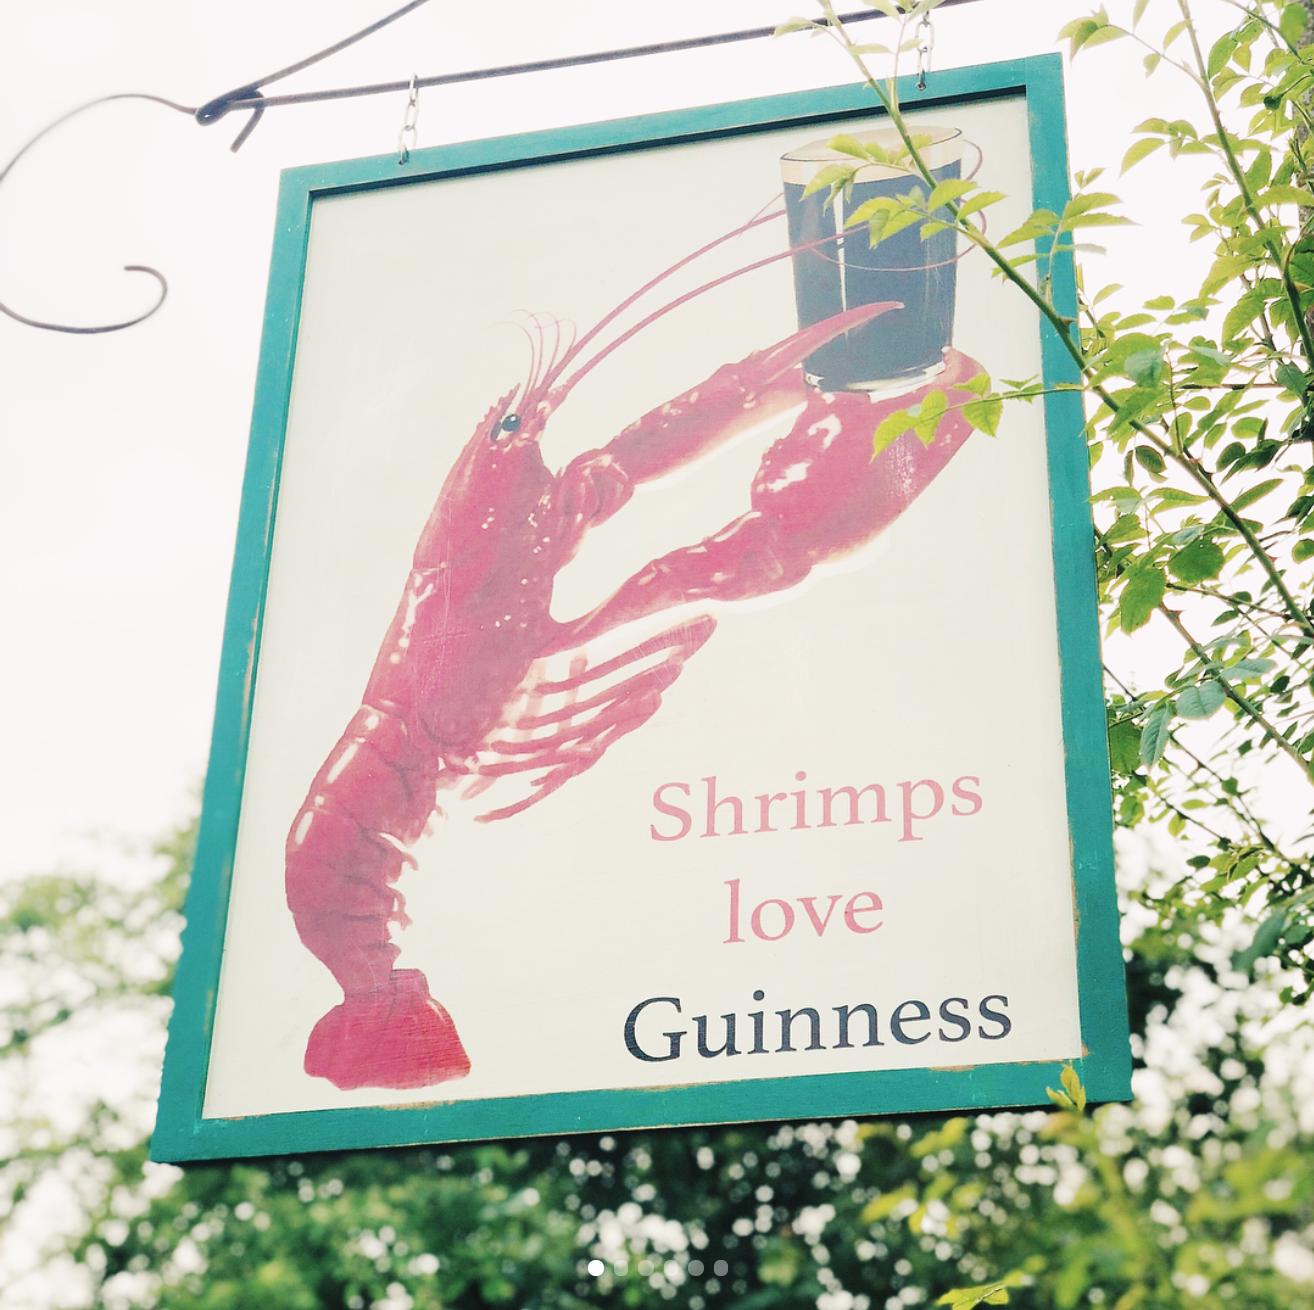 'Shrimps love Guinness' @scarcurtis